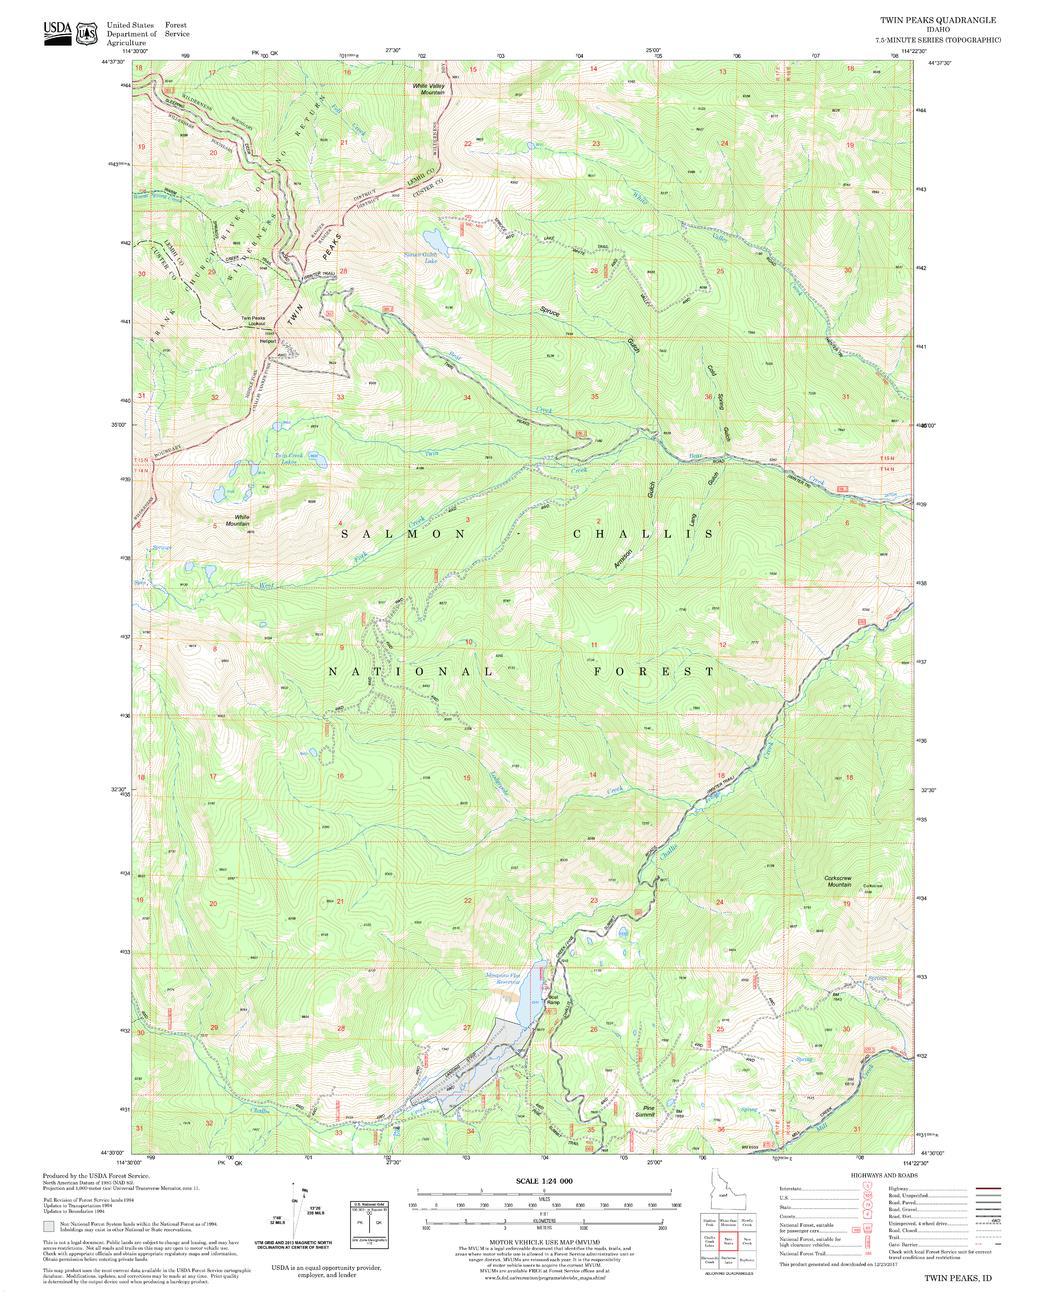 Twin Peaks Quadrangle Map, Idaho